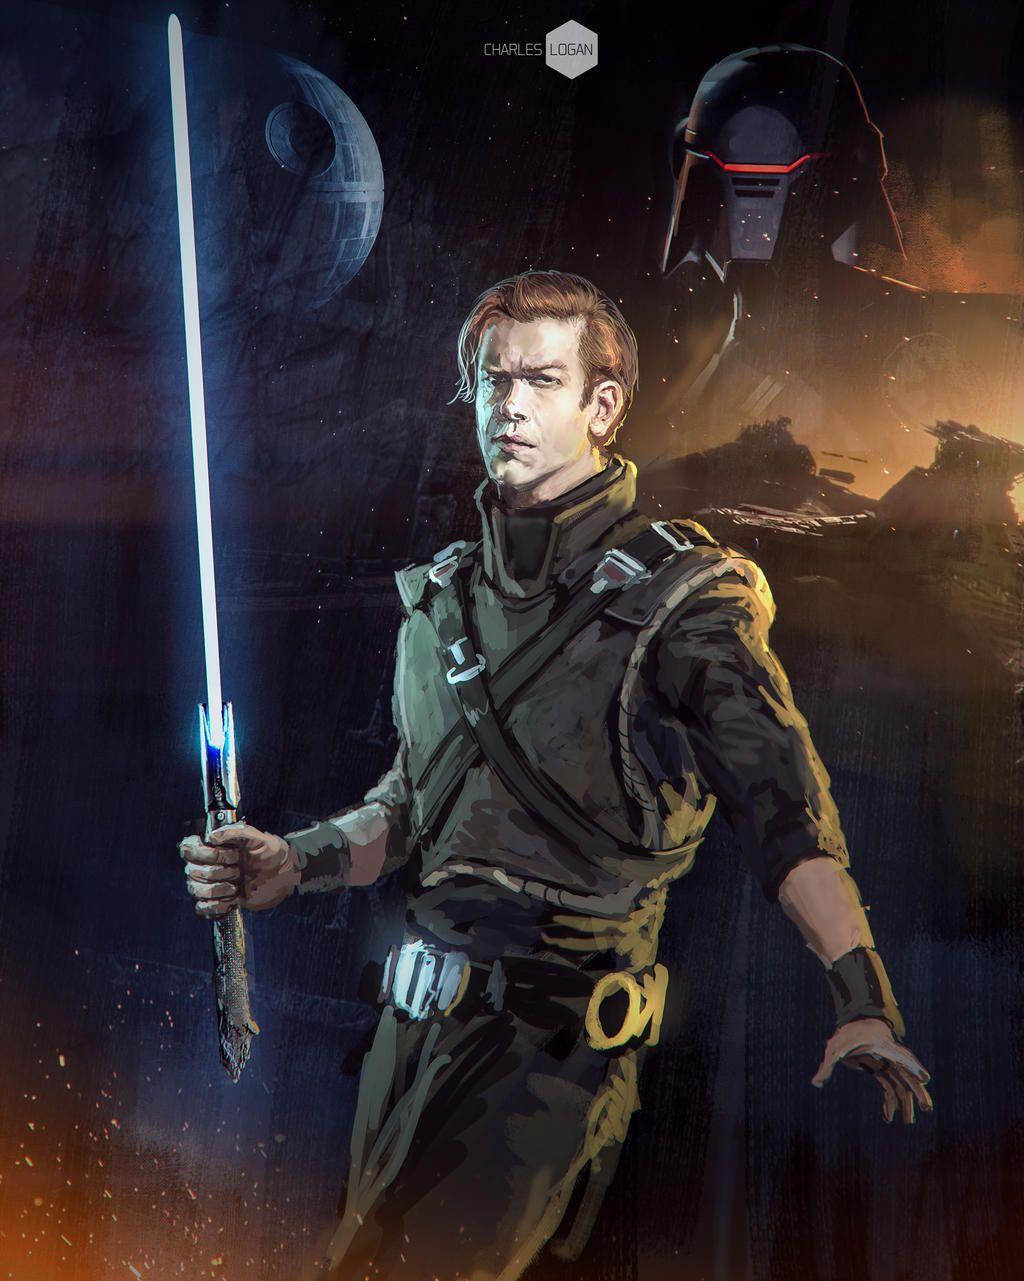 Pin by Corbin Kelley on Star Wars Star wars jedi, Jedi